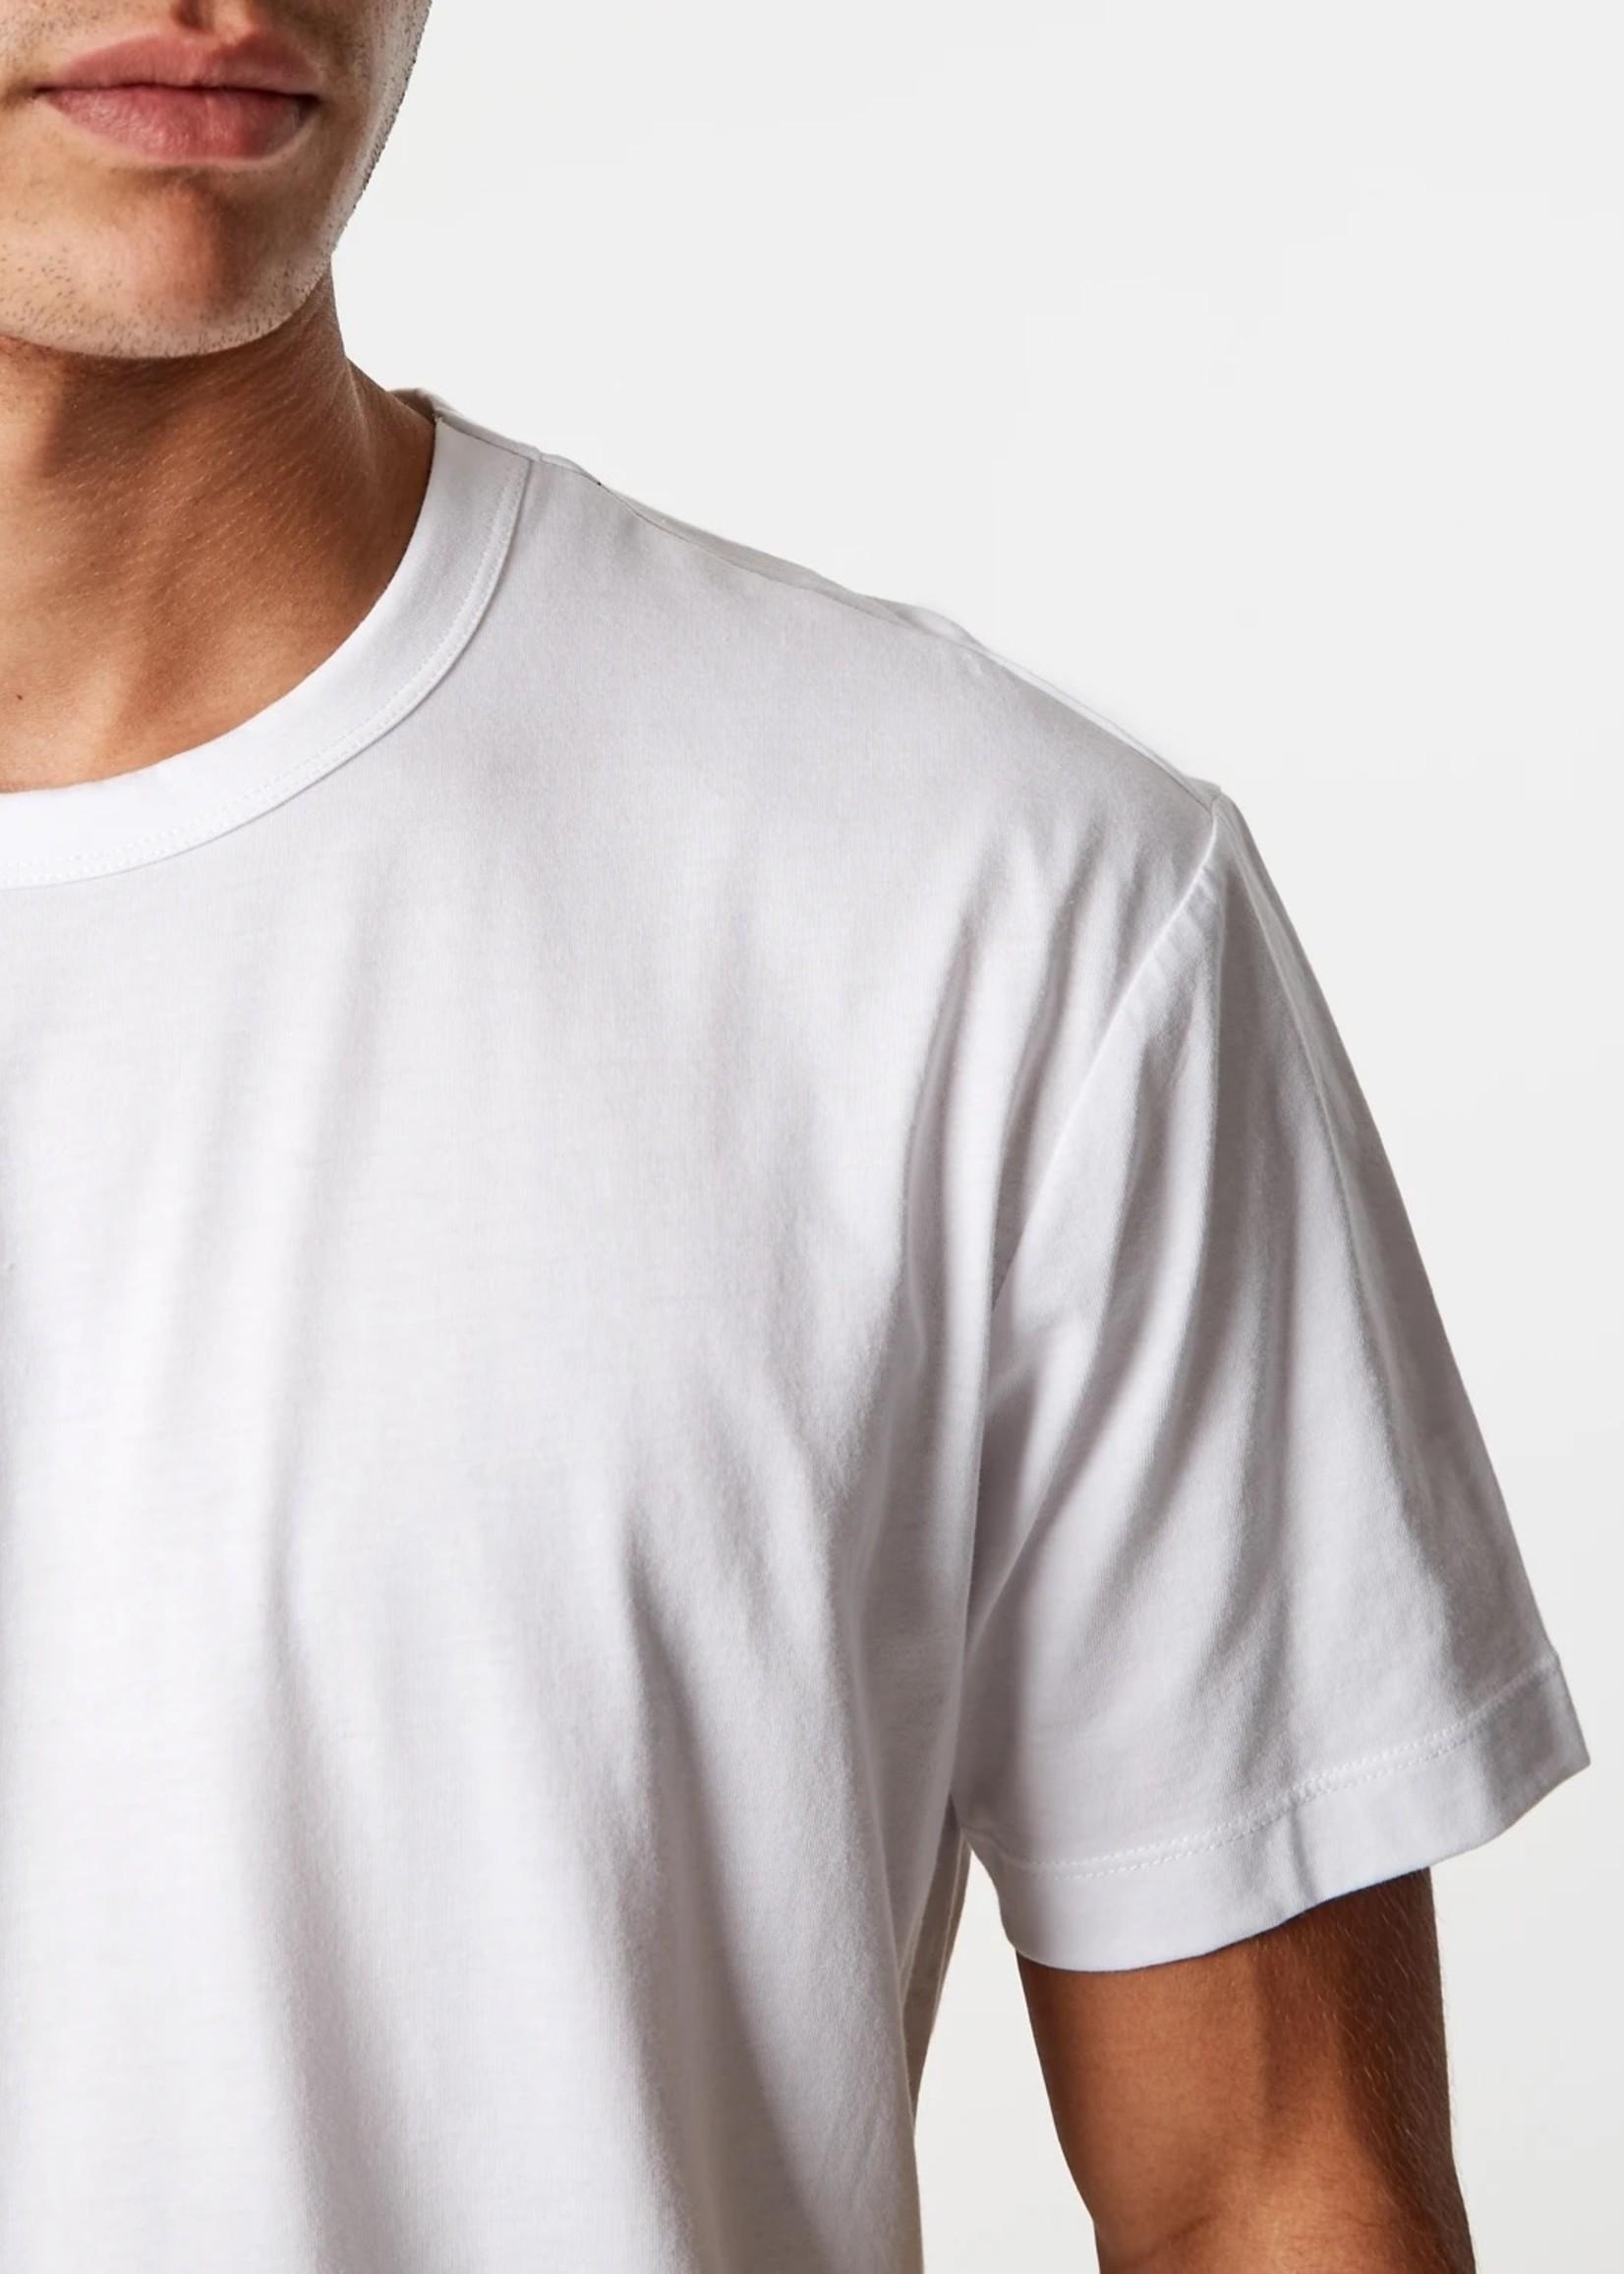 7 Diamonds Iqonicq Supima T-Shirt- White